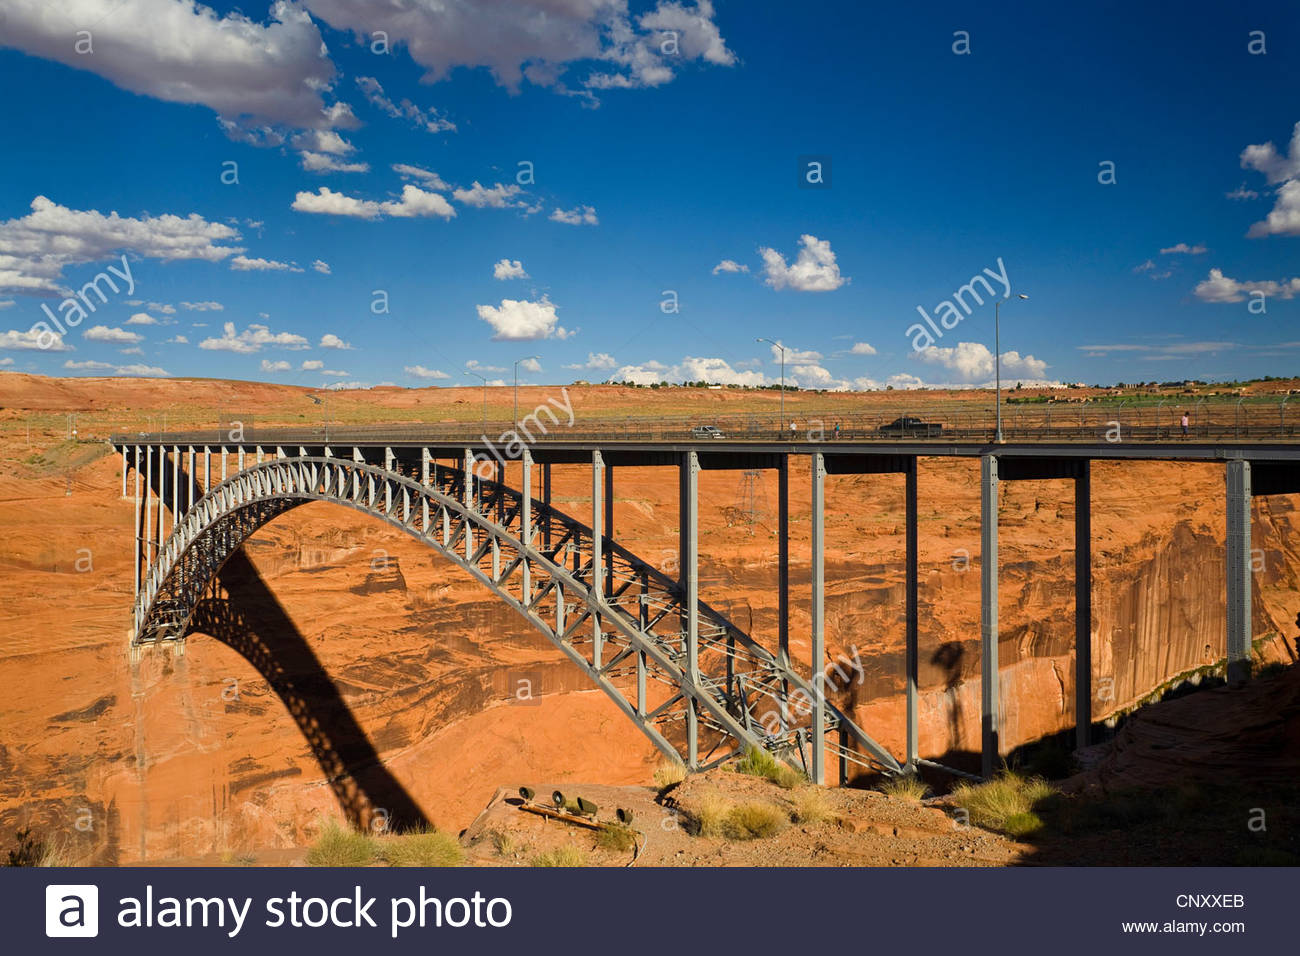 Canyon Bridge Stock Photos & Canyon Bridge Stock Images.